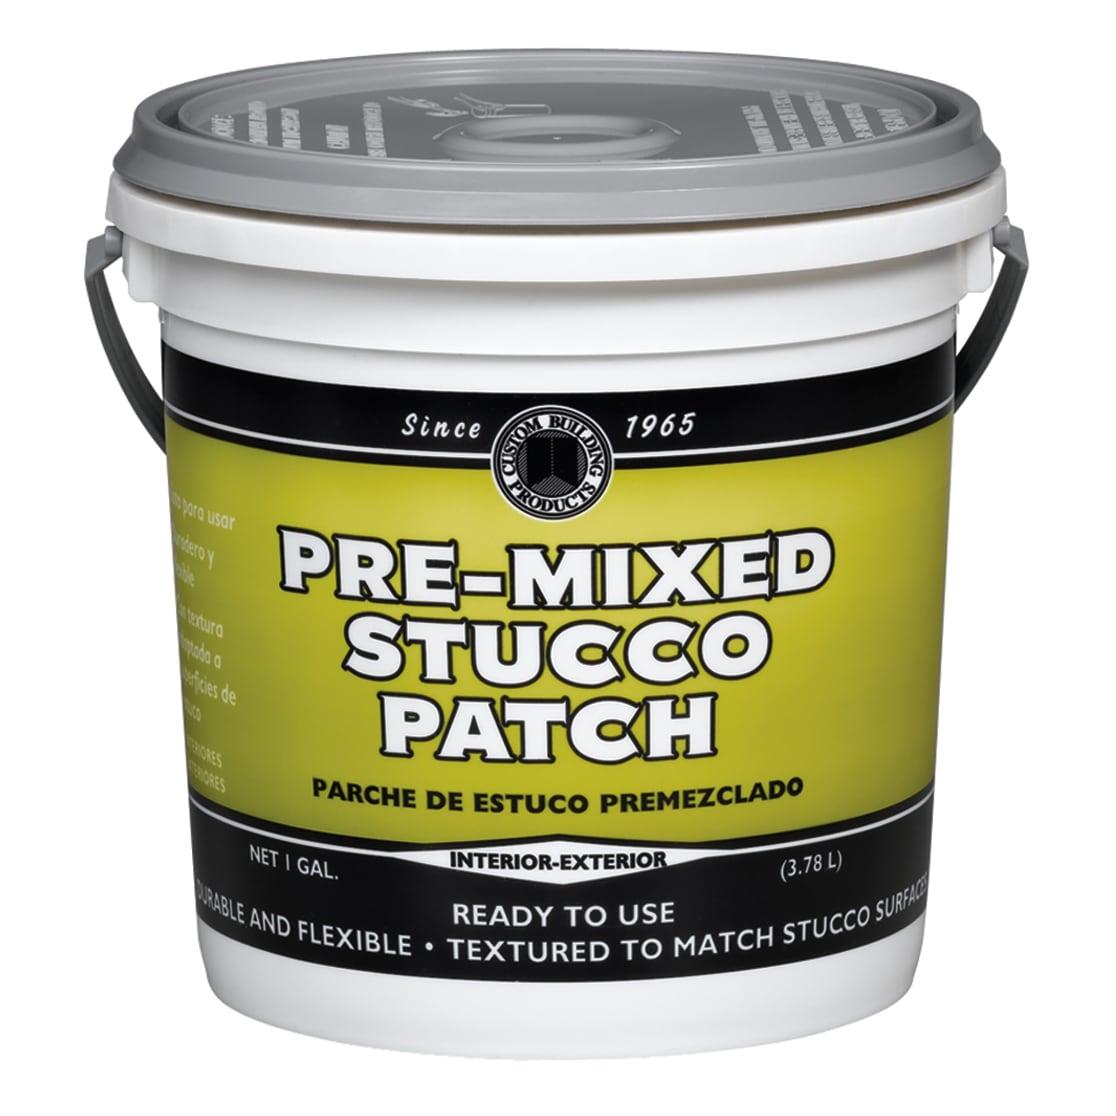 DAP 60817 1 Gallon Pre-Mixed Stucco Patch (Spackling & Pa...